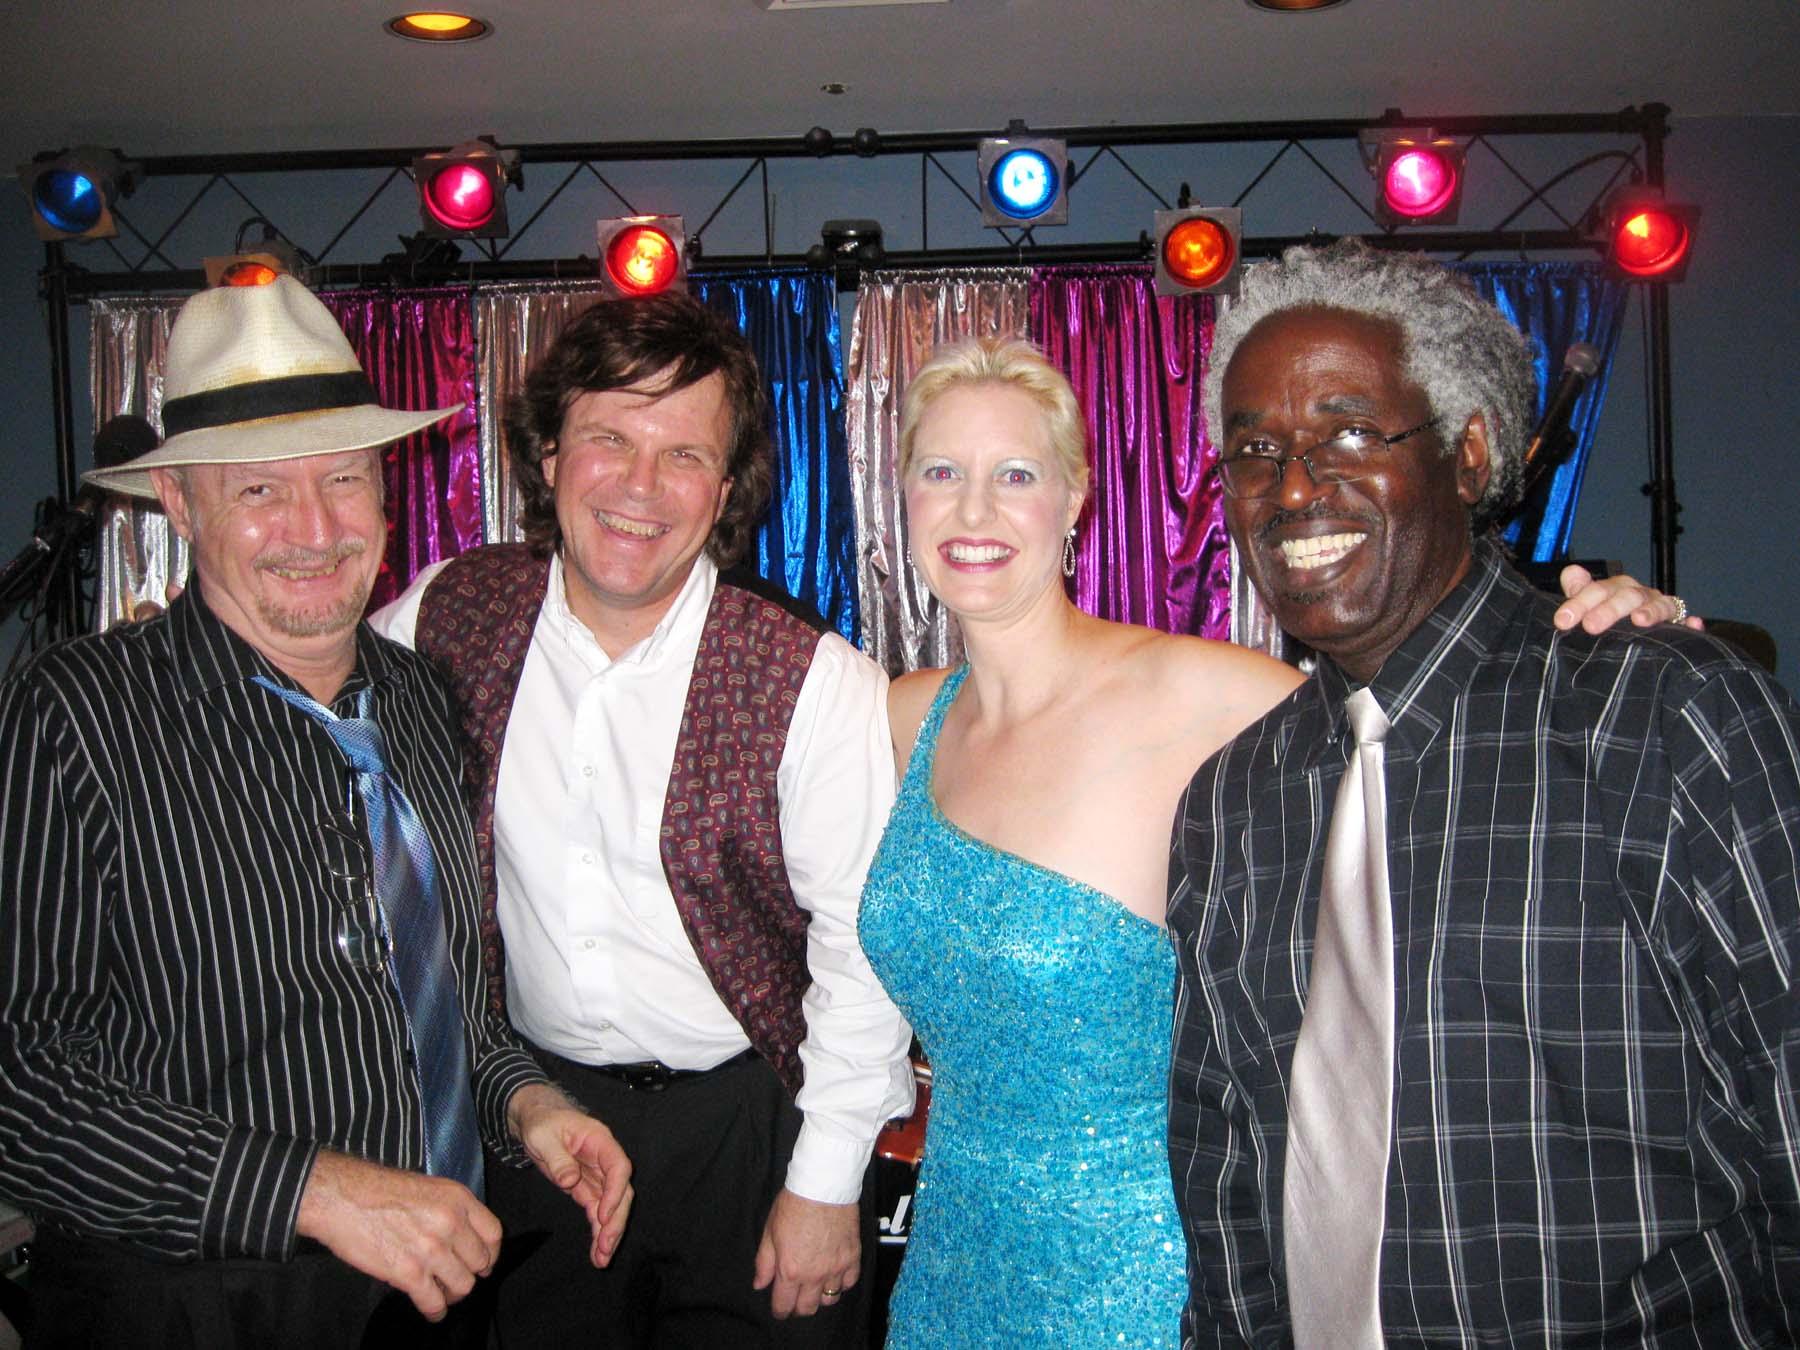 Photo (L-R):  Paul Needles, Rick Barclay, Dr. M.J. Price, Gary Ward